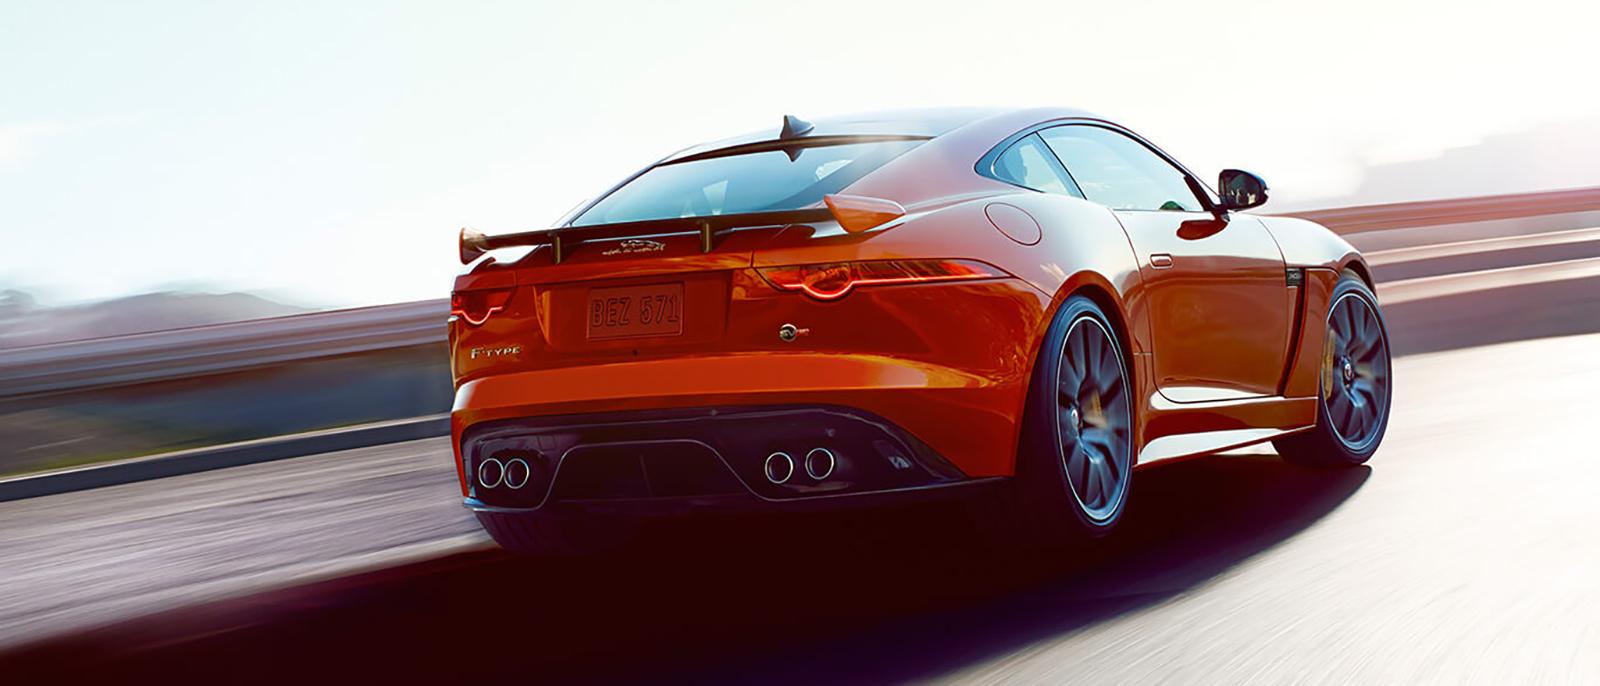 2017 Jaguar F-Type rear